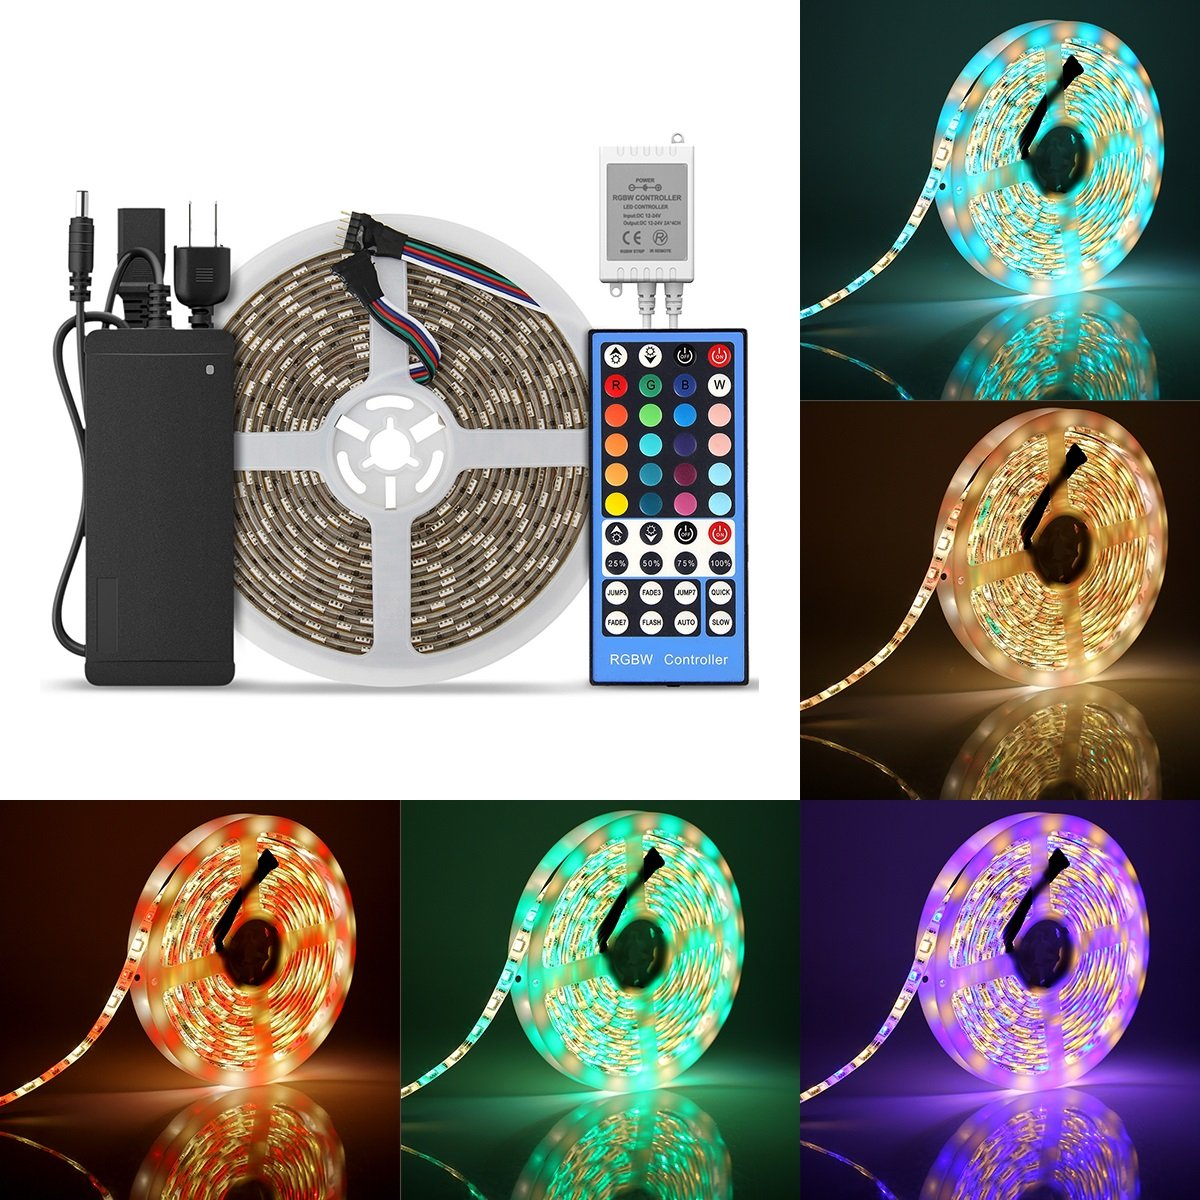 BZONE 5m SMD5050 Multicolor Waterproof LED Strip Lights Flexible LED Lighting Strip Kit 16.4ft RGBWW + 12V 6A 40 Keys Mini Wireless Music IR Remote Controller + Power Supply